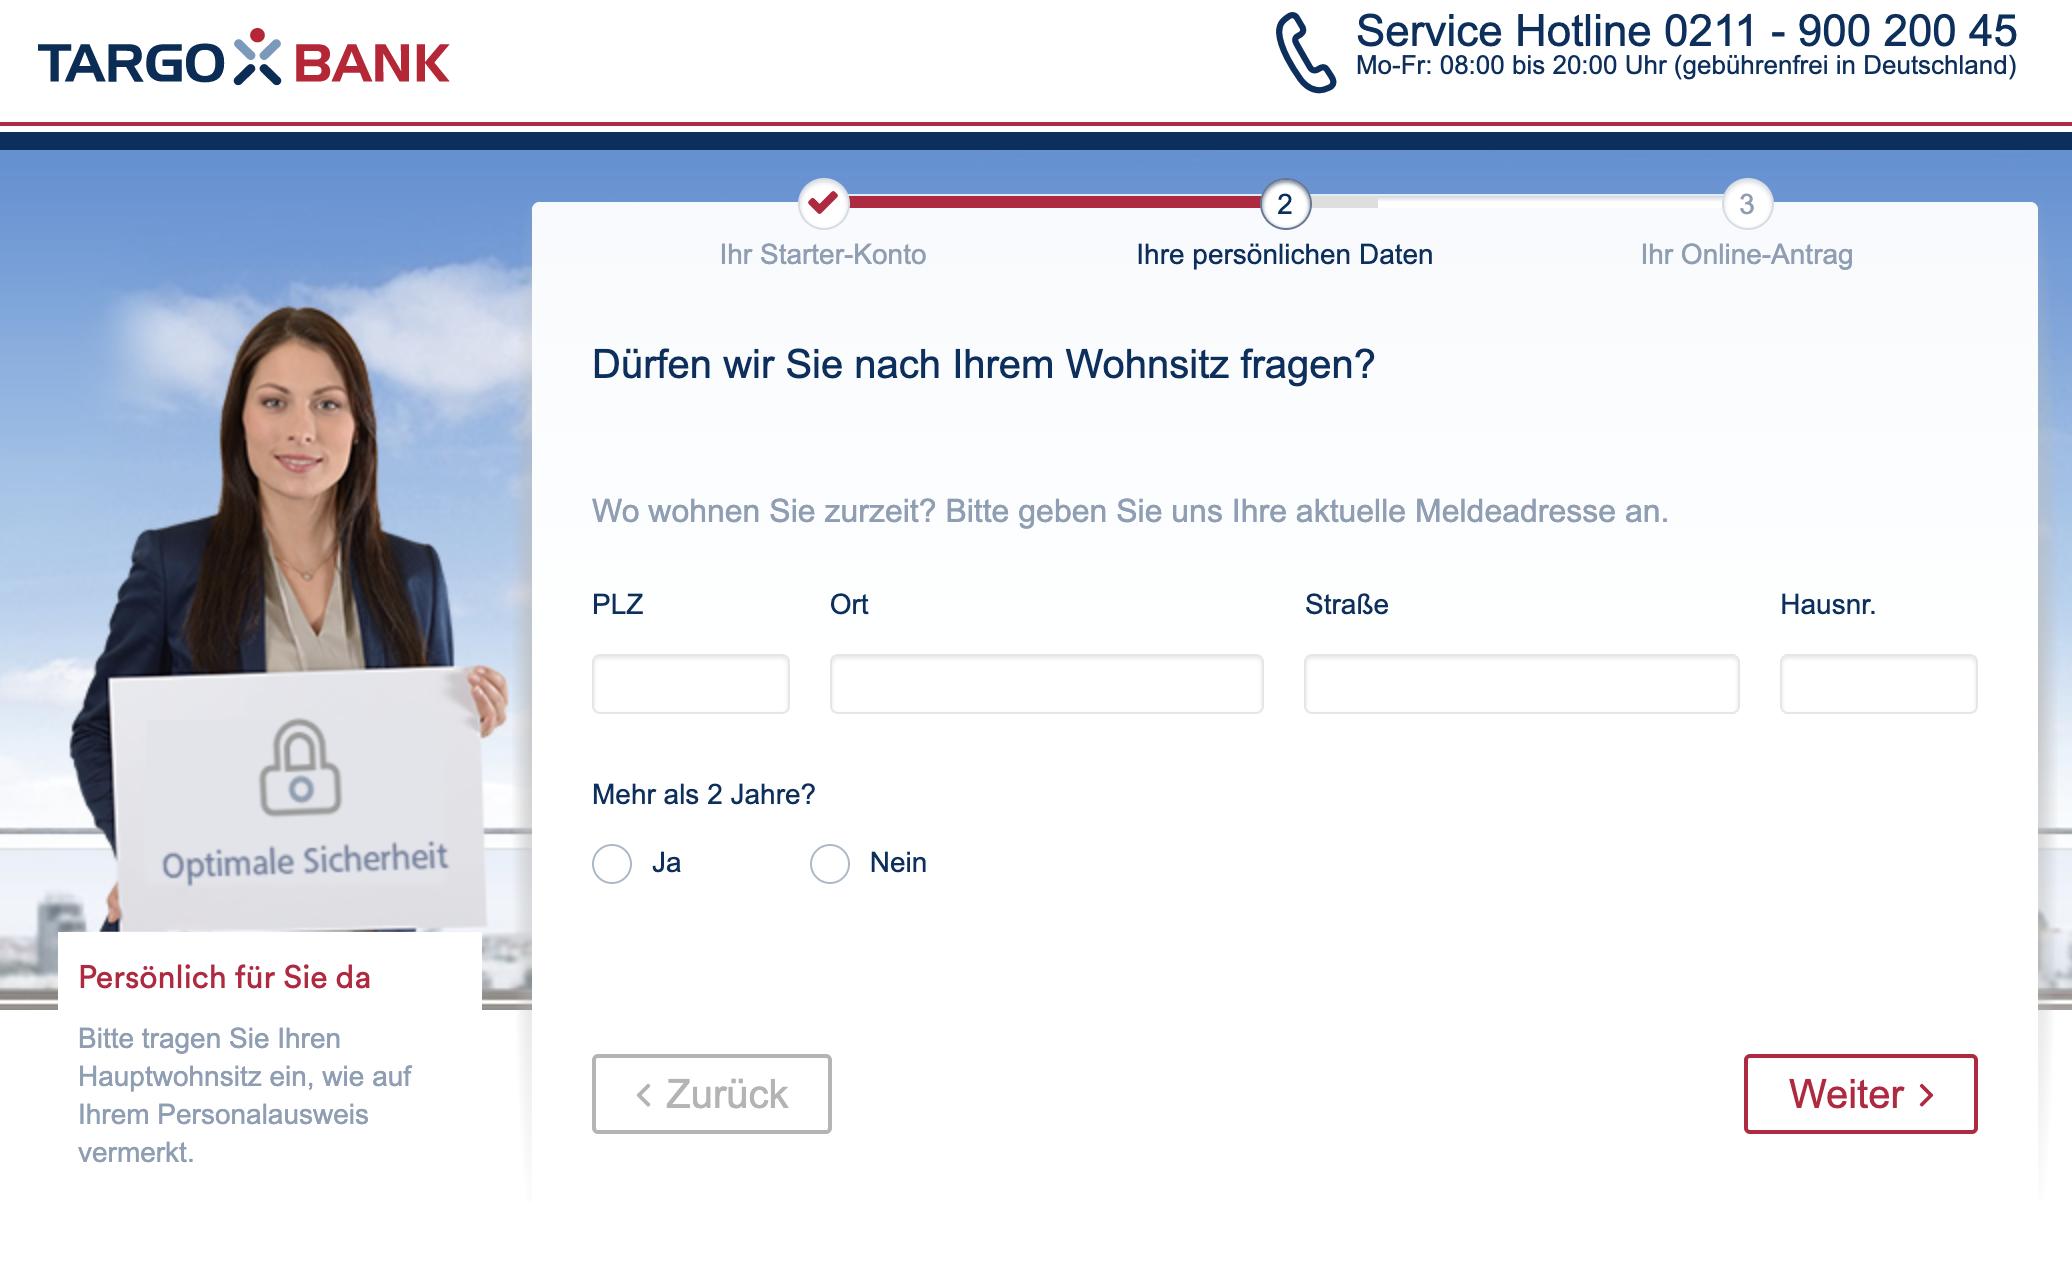 Targobank-Girokonto-Eröffnungsprozess-Wohnsitzabfrage